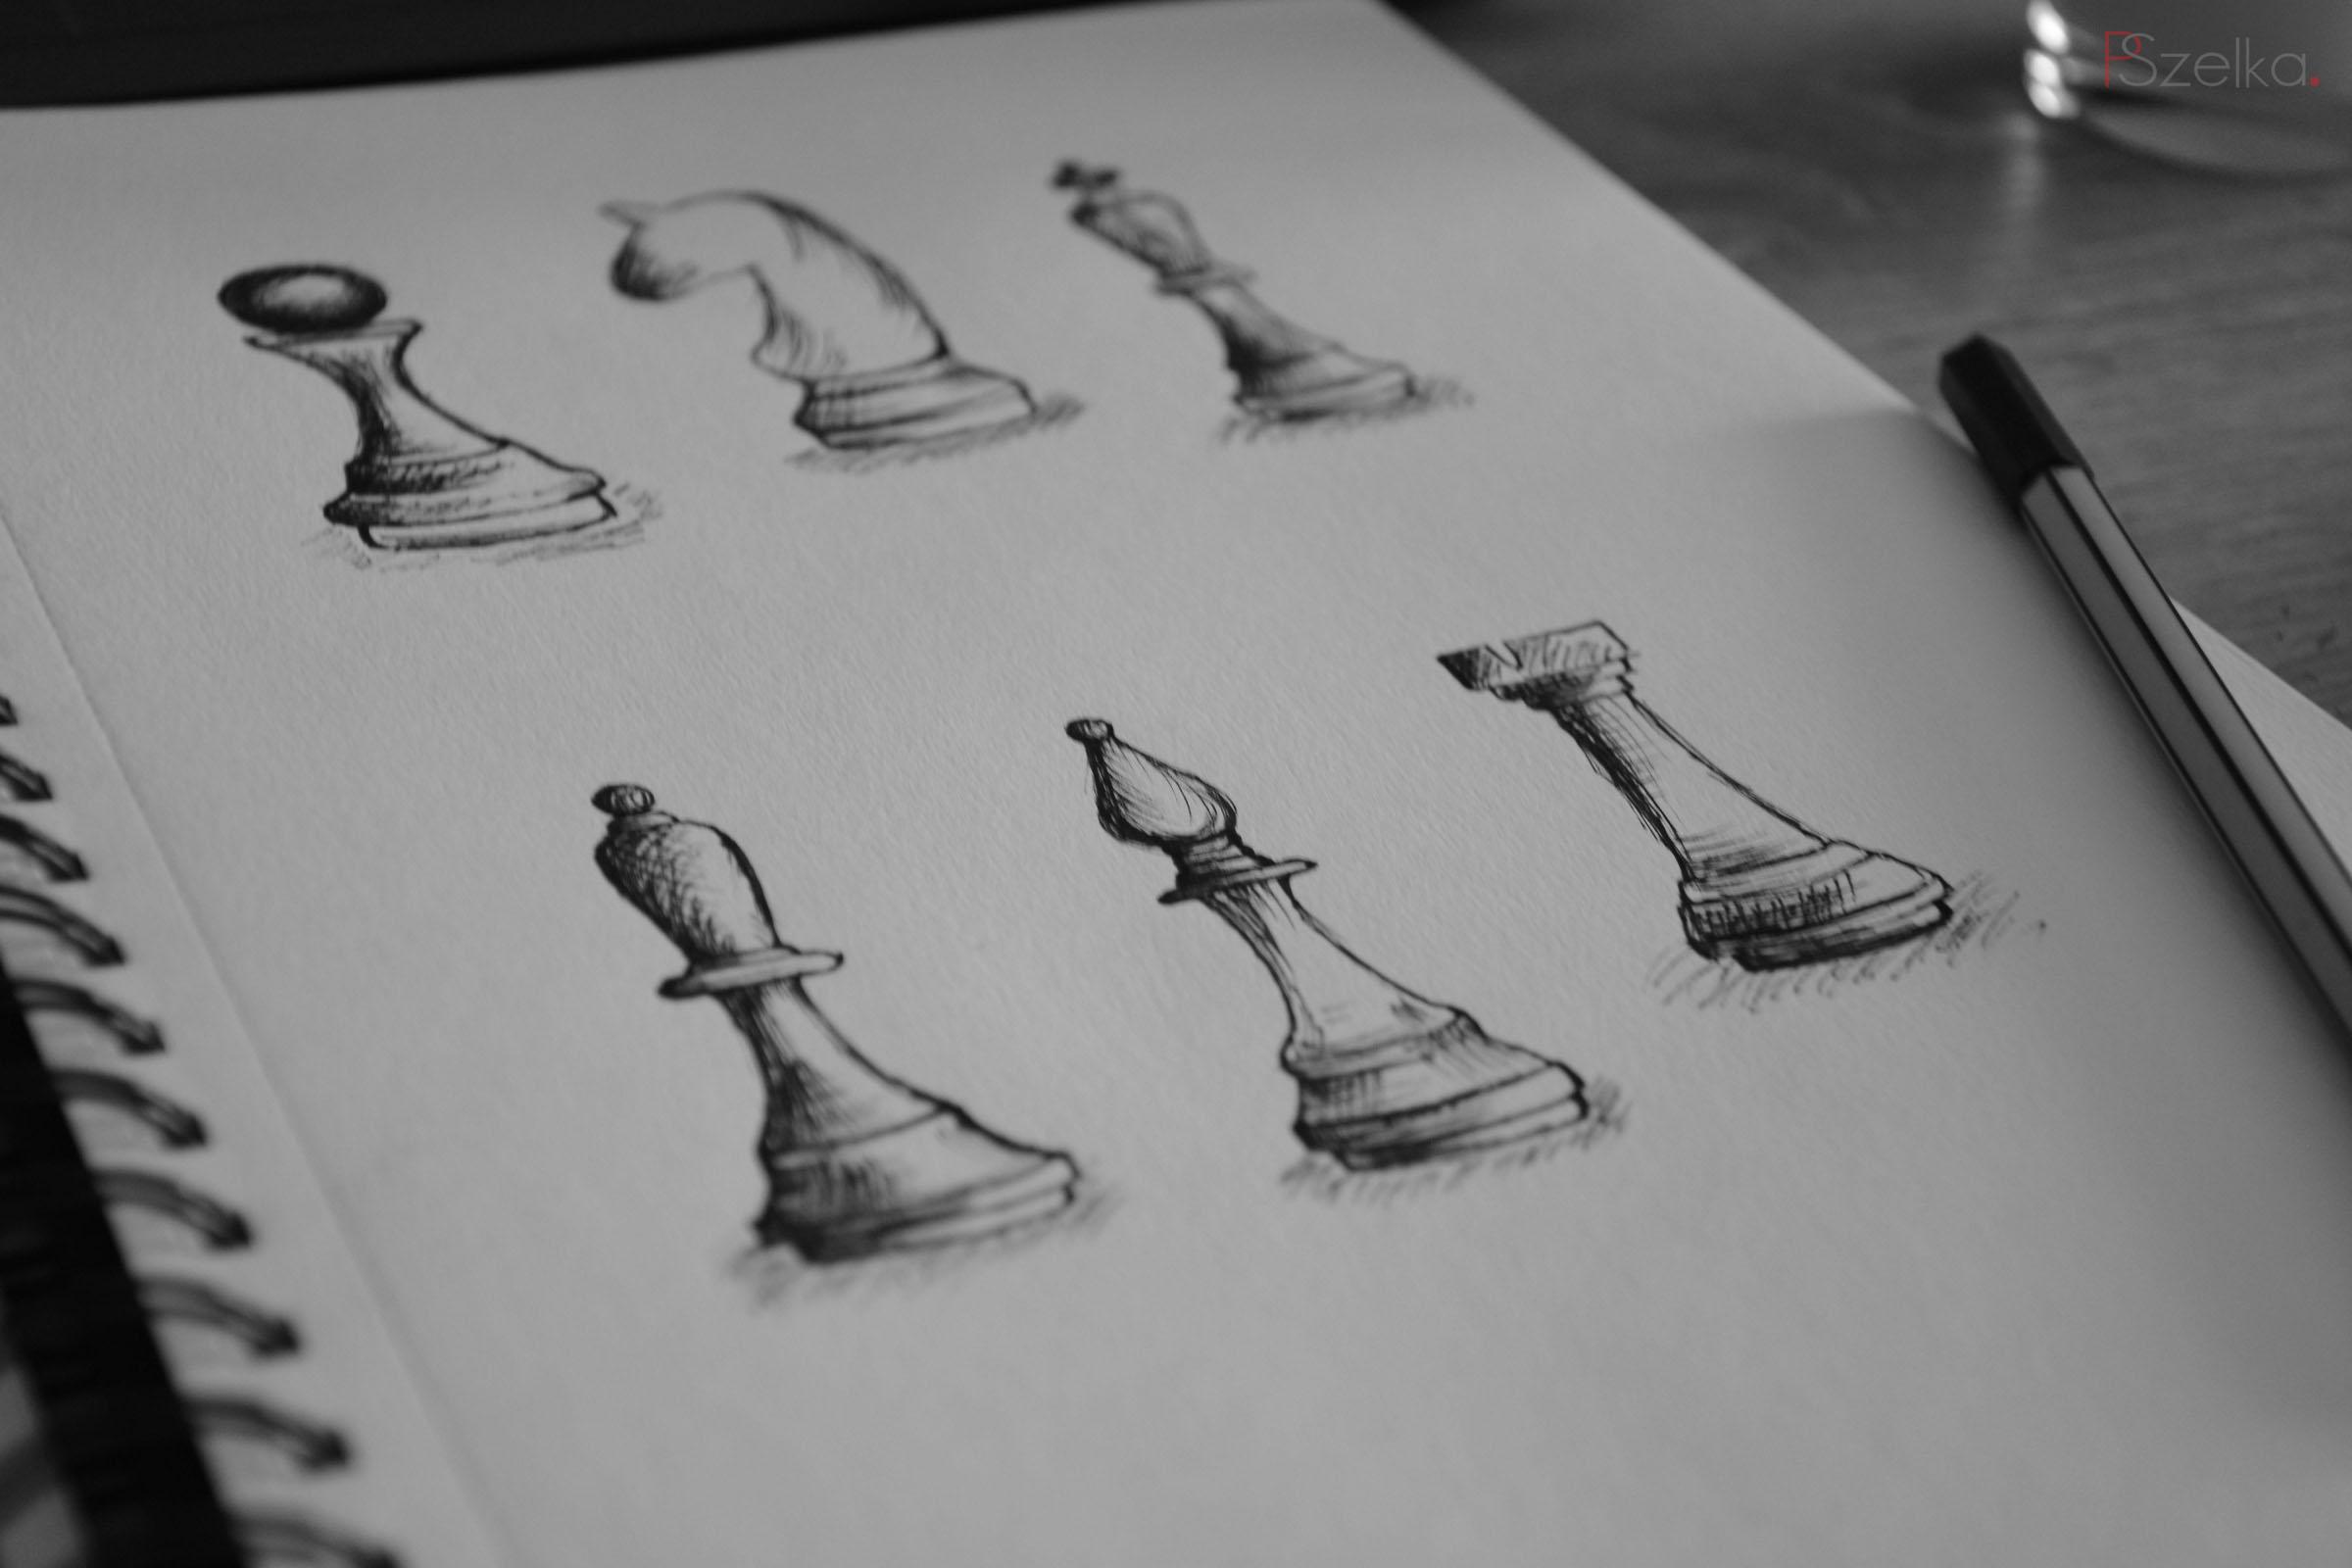 mowie-zyciu-szach-mat